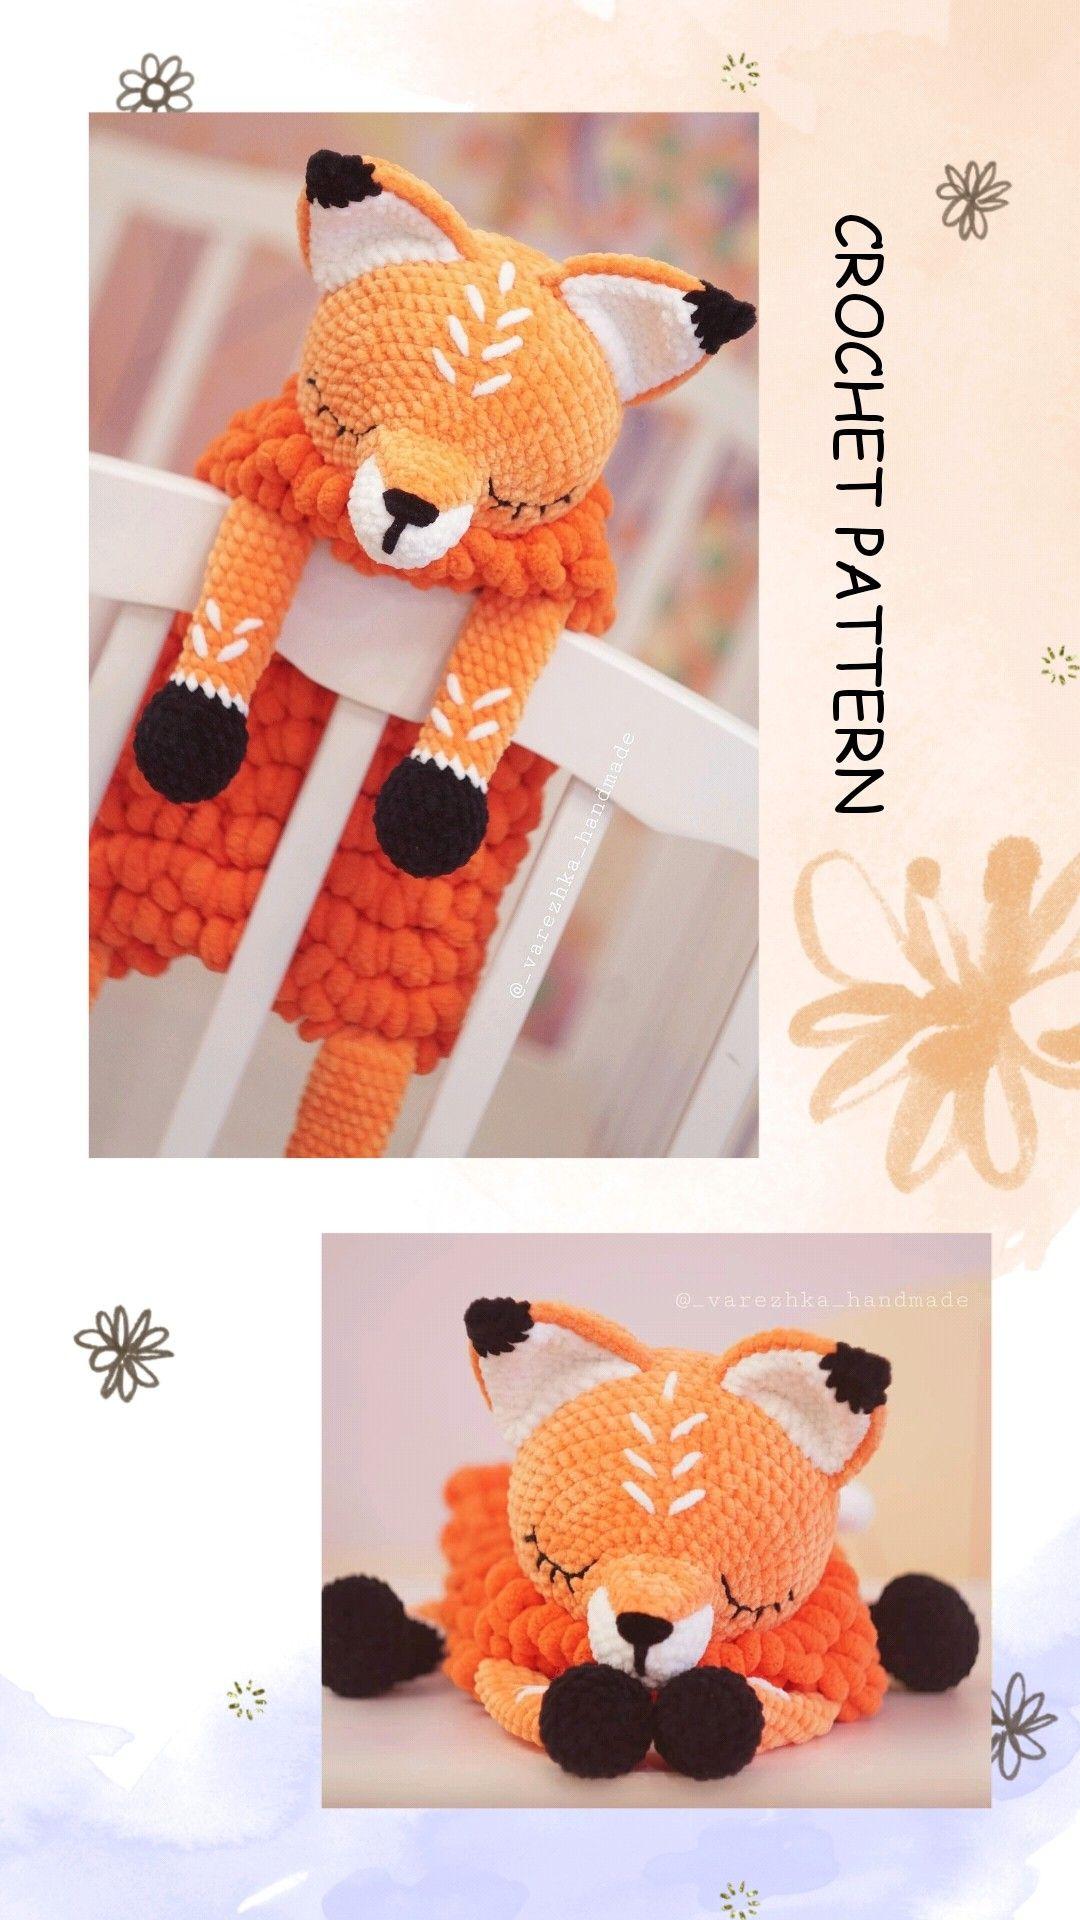 Crochet Fox PATTERN, Amigurumi animals tutorial BIG Softy Fox pattern, Lovey stuffed fox CROCHET